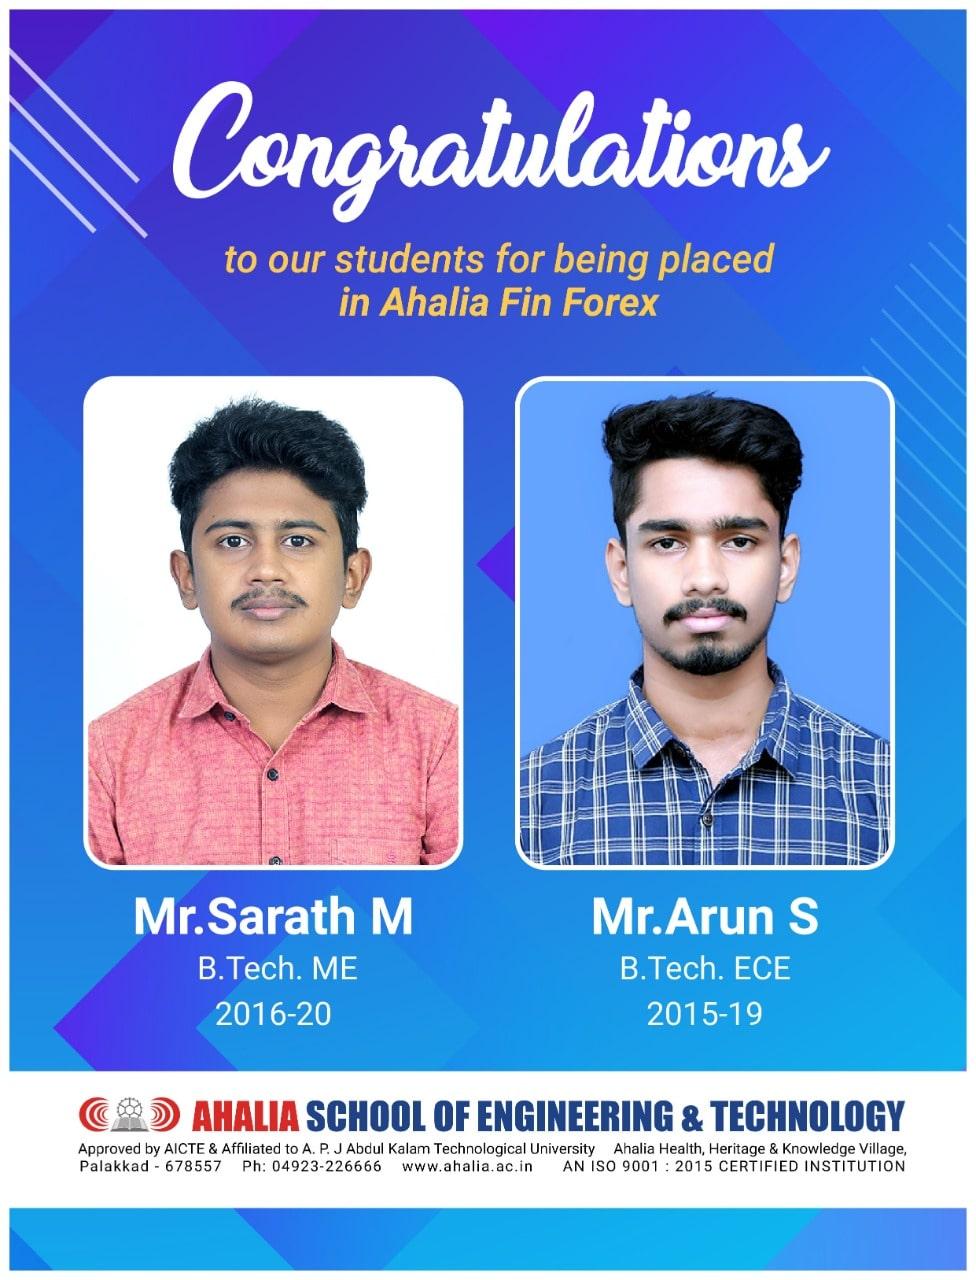 Sarath M., Arun S. Placed in Ahalia FinForex